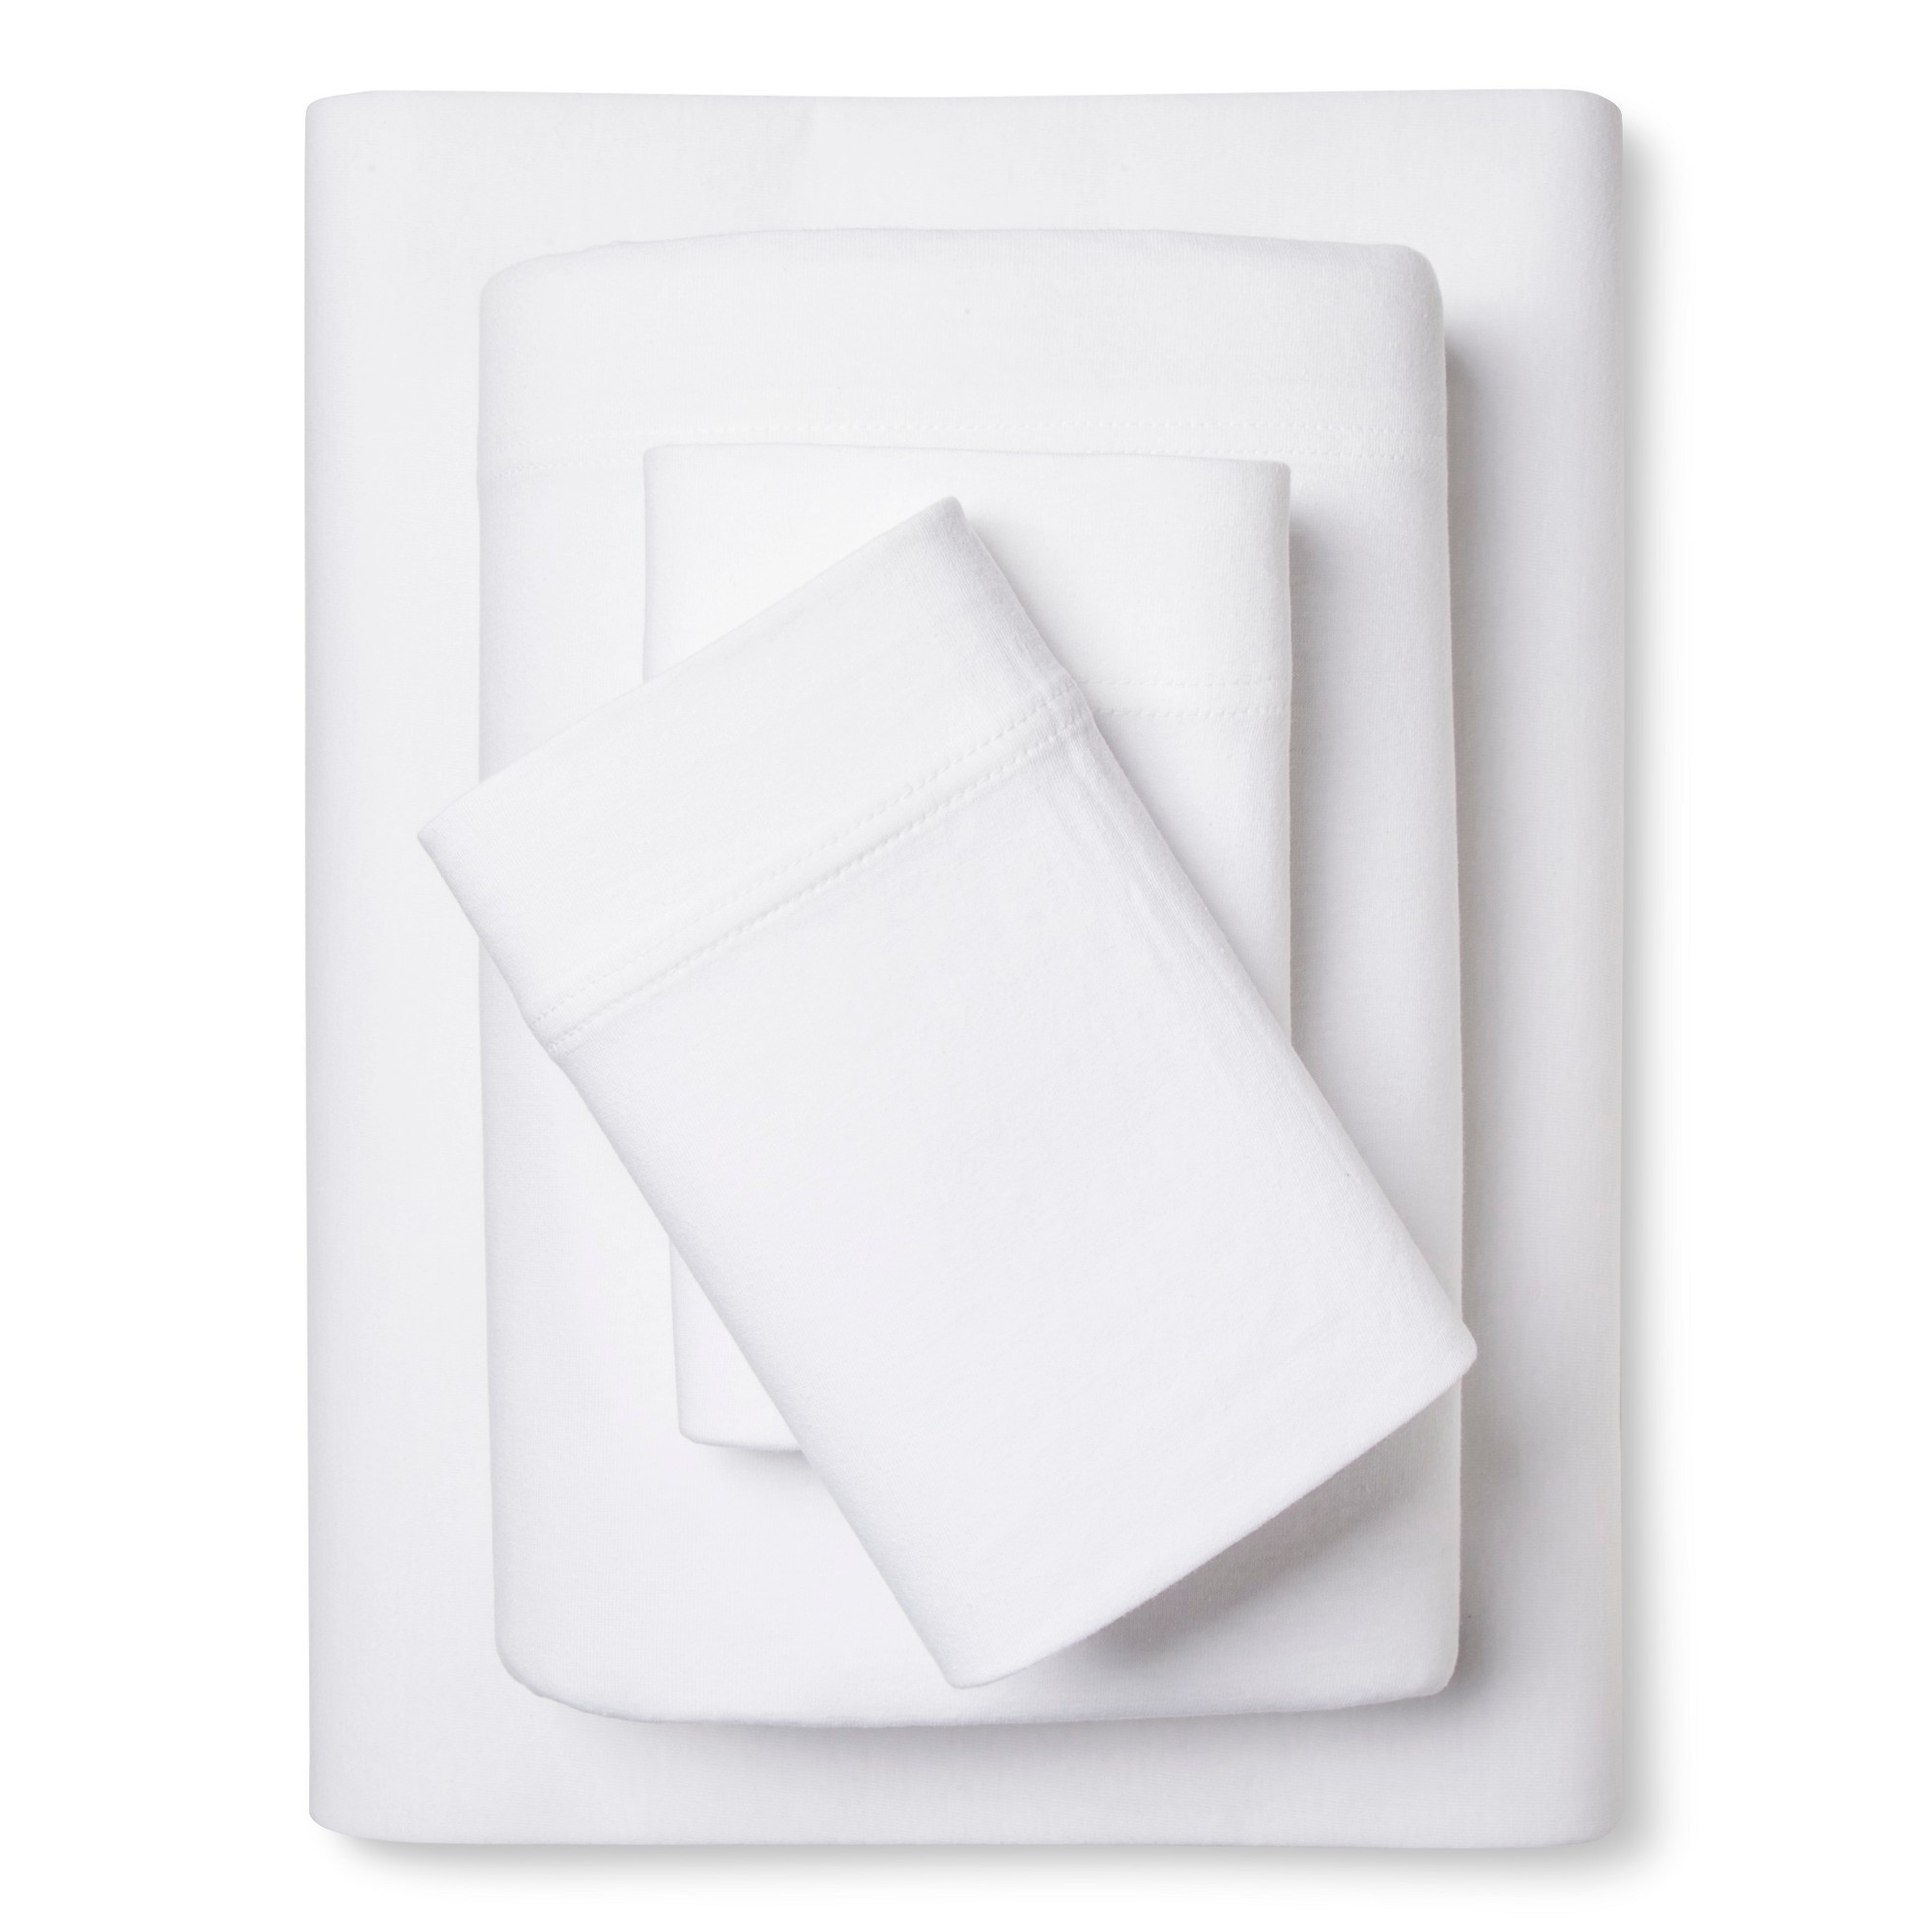 Jersey Sheet Set - (California King) White - Room Essentials